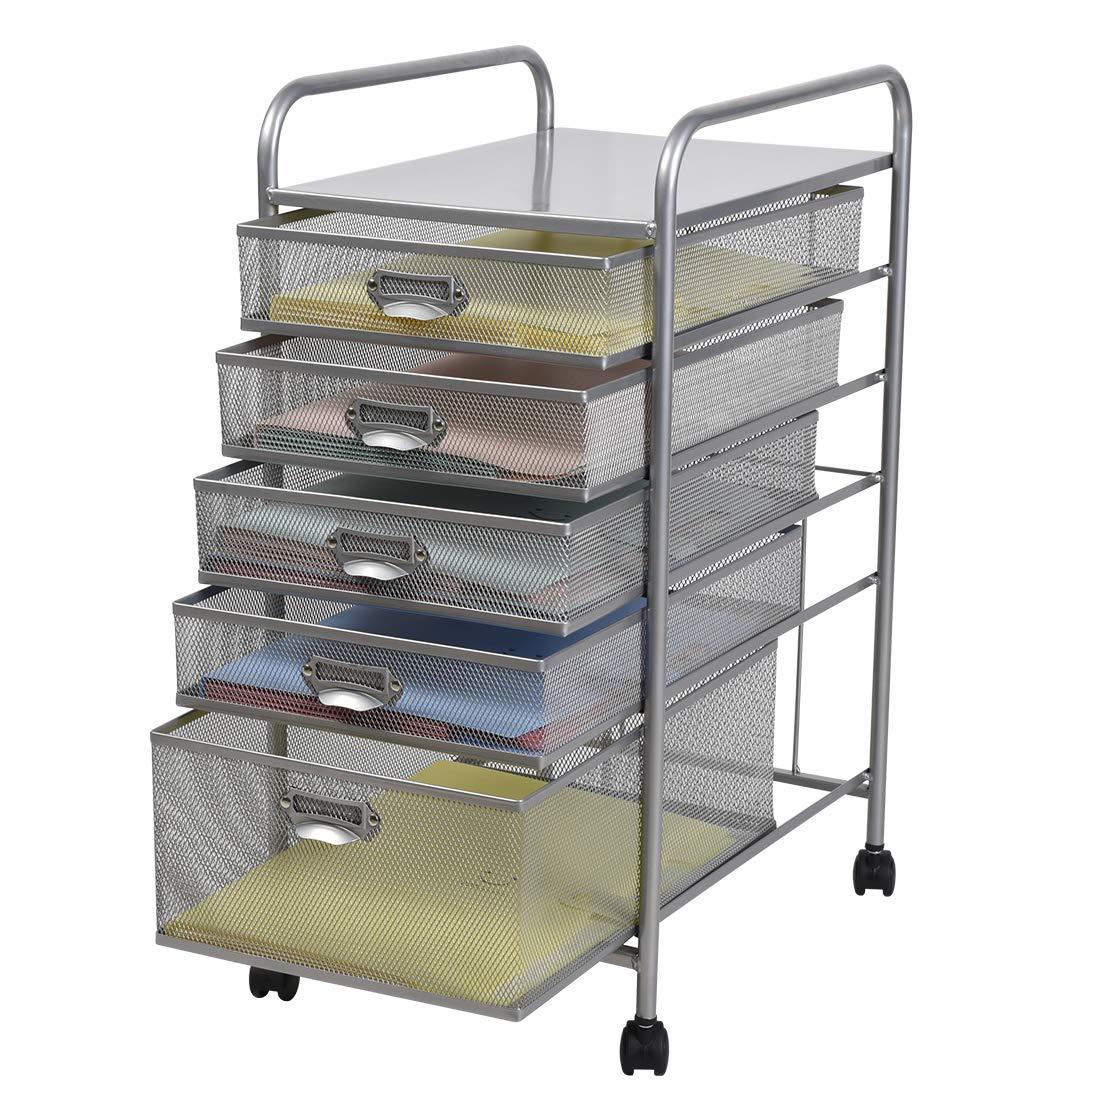 100% Metal Mesh 5 Drawer Rolling Cart Storage Organizer File Basket Cart Office&Home Cabinet-Silver by sharkbang